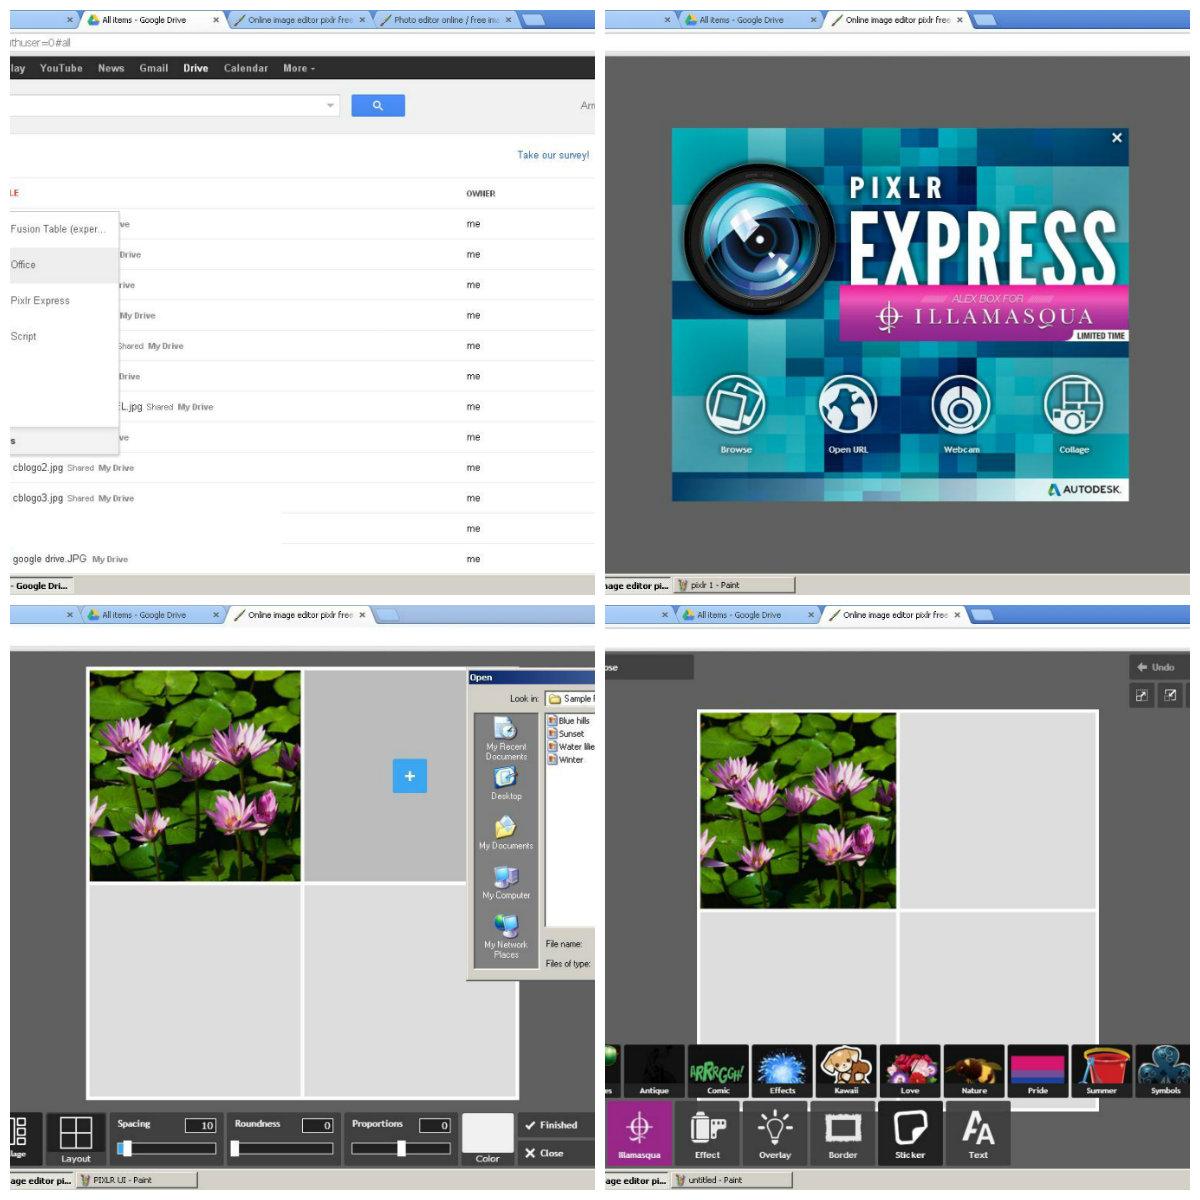 Use Pixlr Express Photo Editor Using Google Docs